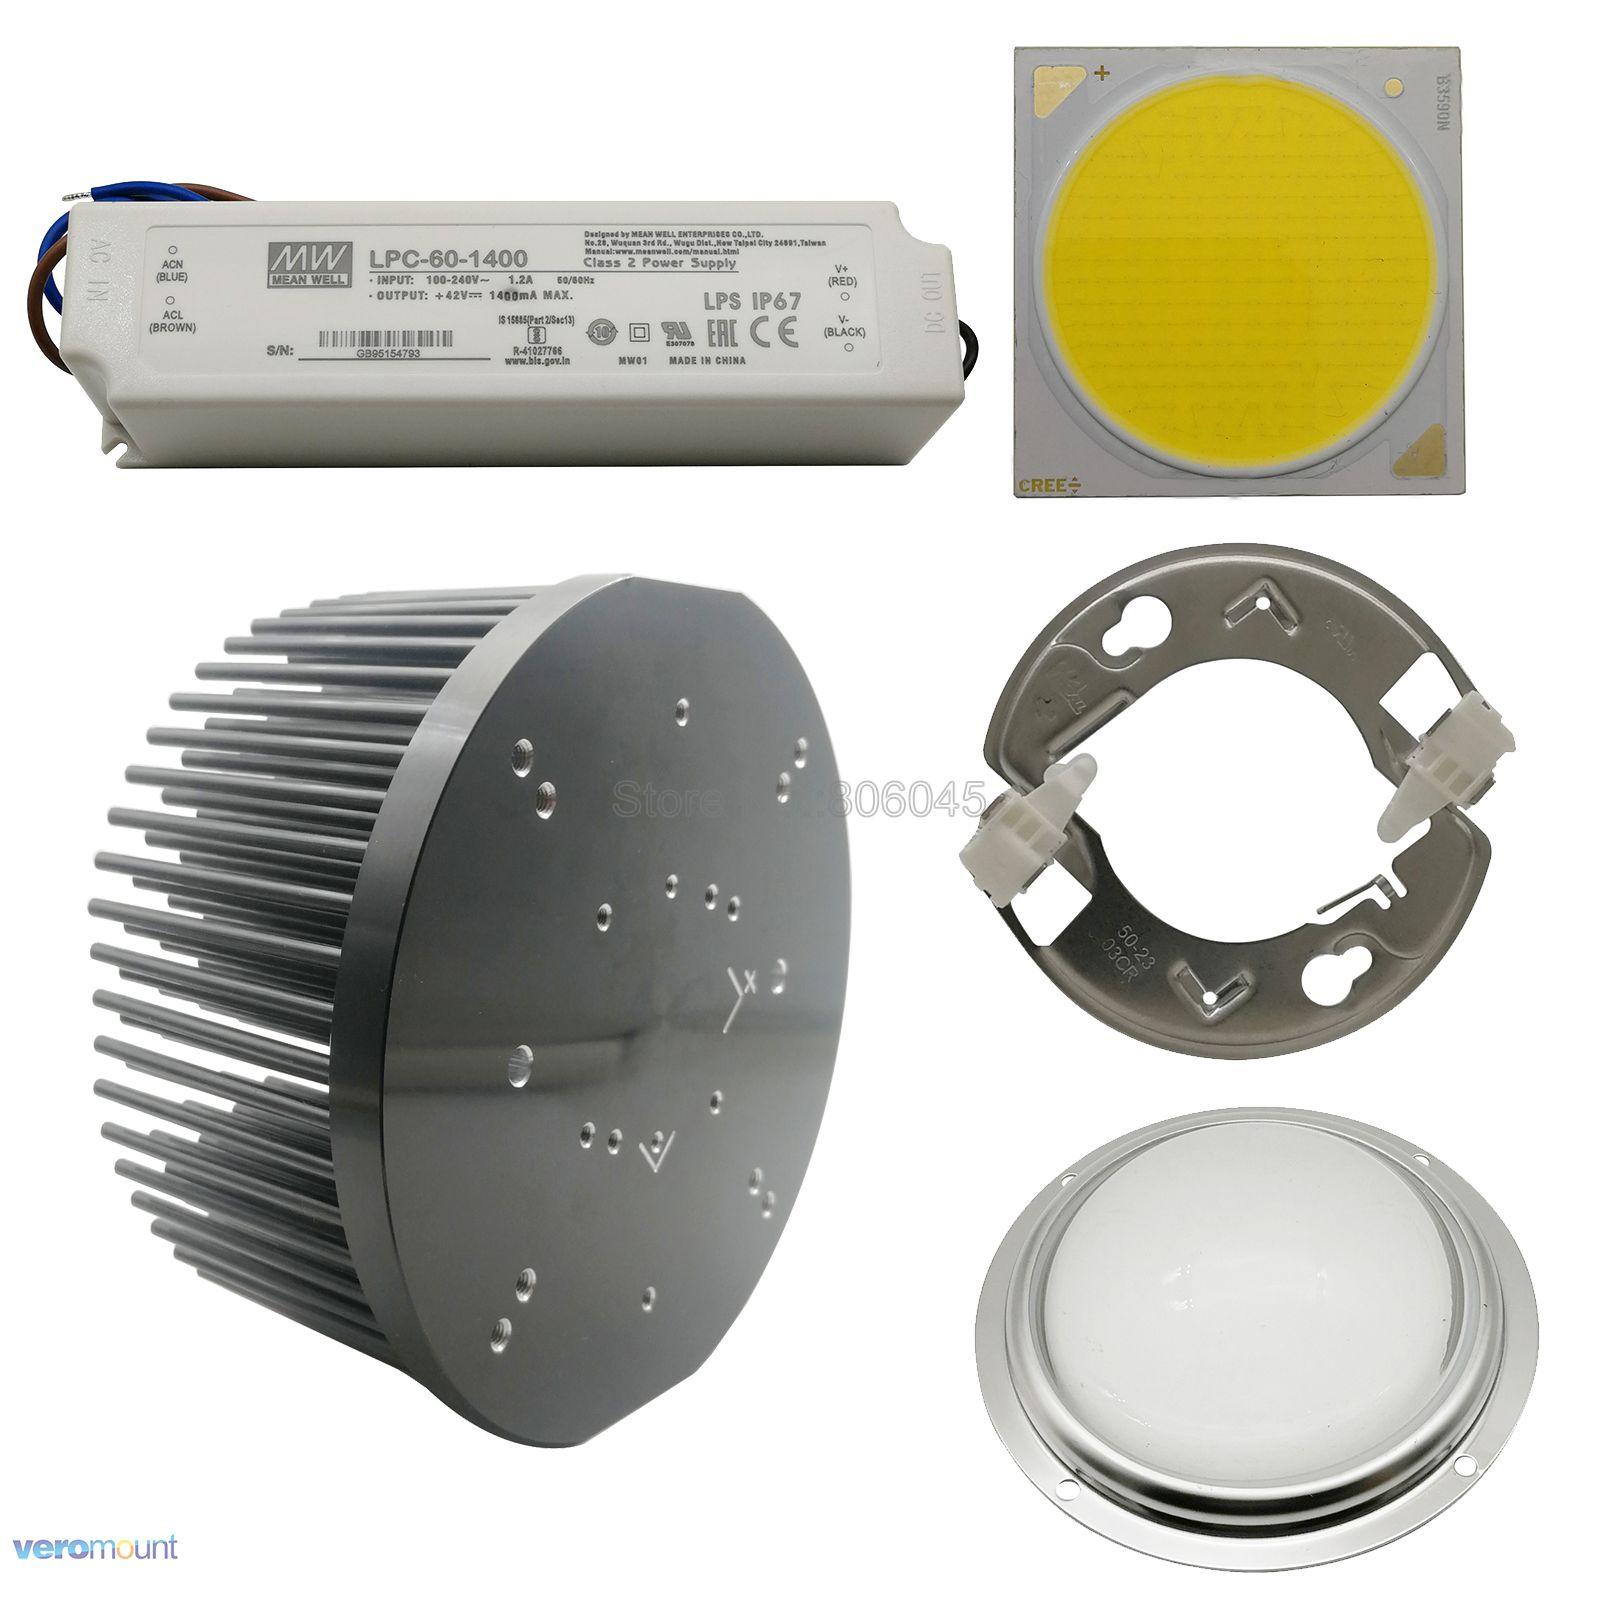 CREE CXB3590 COB LED Grow Light Ideal holder 50-2303CR 133mm Heatsink Meanwell Driver LPC-60-1400 100mm Glass Lens DIY Full Set